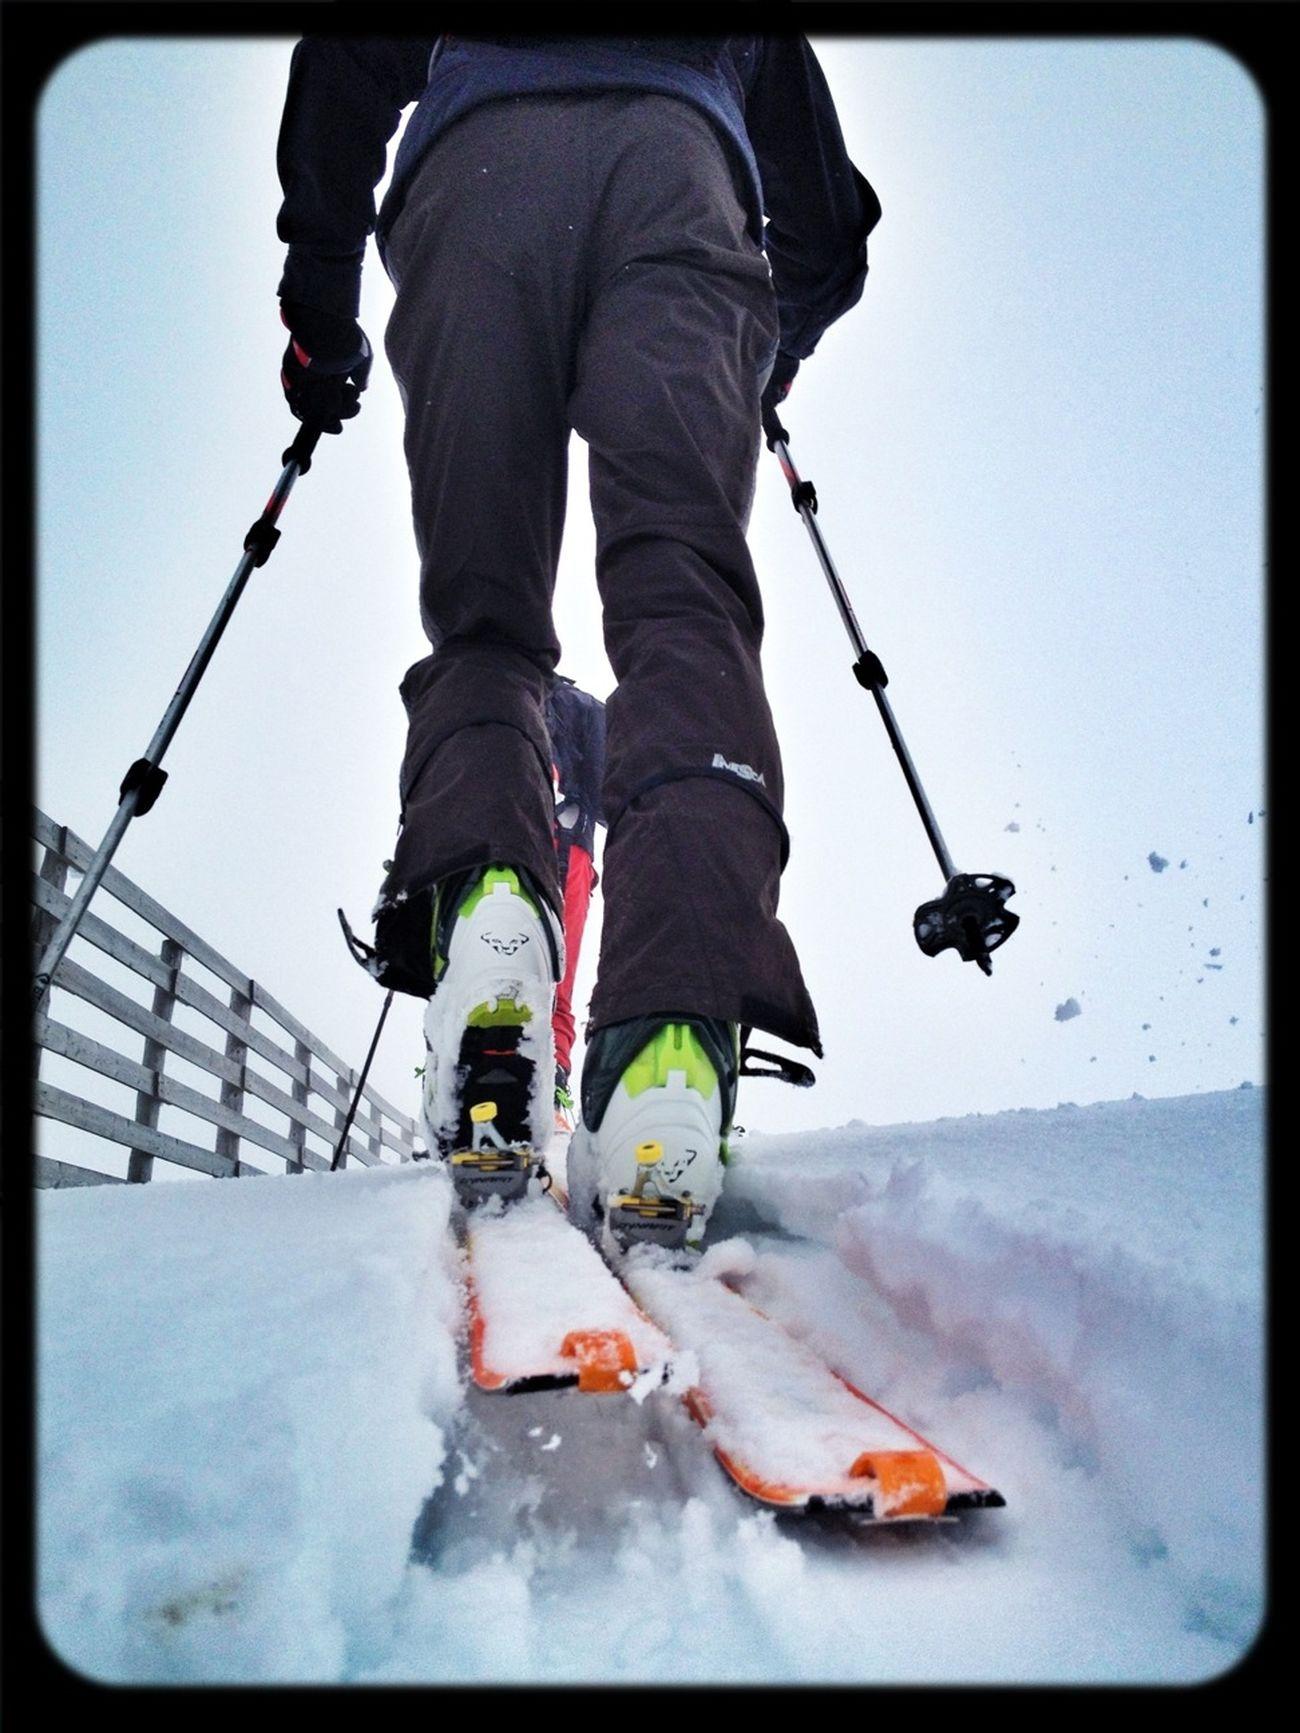 Continúa La Temporada #dynafit #skimountaineering #skimo #esquídemontaña #boladelmundo #mountain #spring #ilovemountains #primavera #gasss #training #badsnow #fog